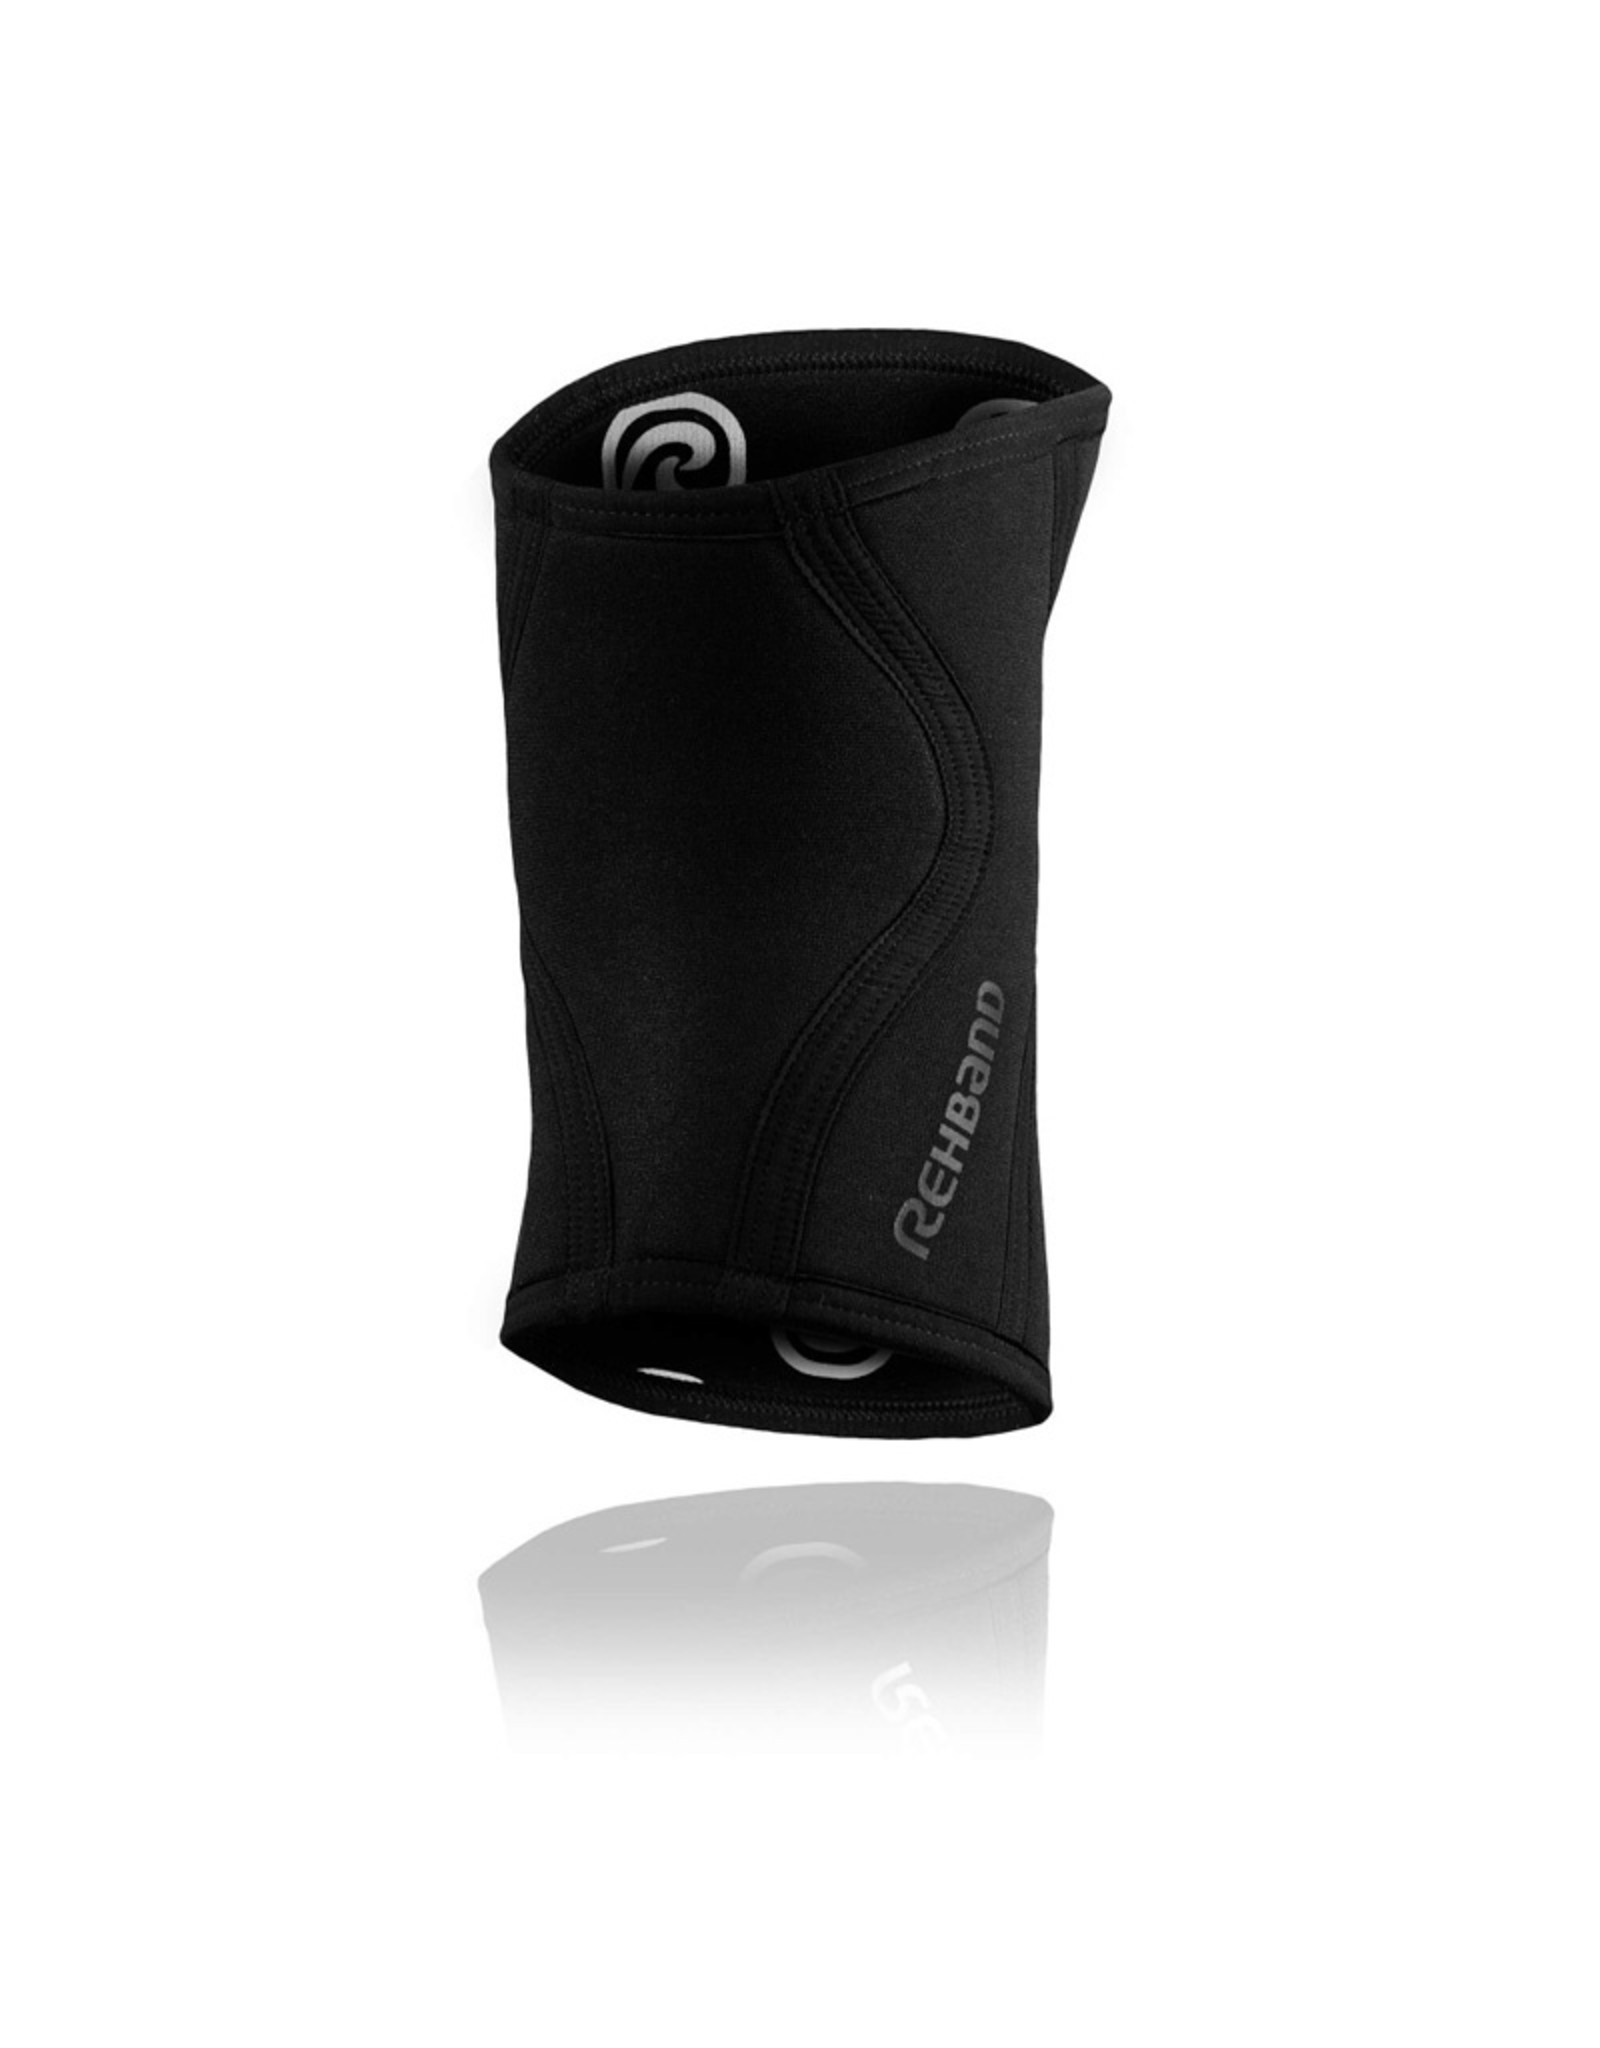 Rehband Rx Knee Sleeve 7Mm Genouillere - Carbon